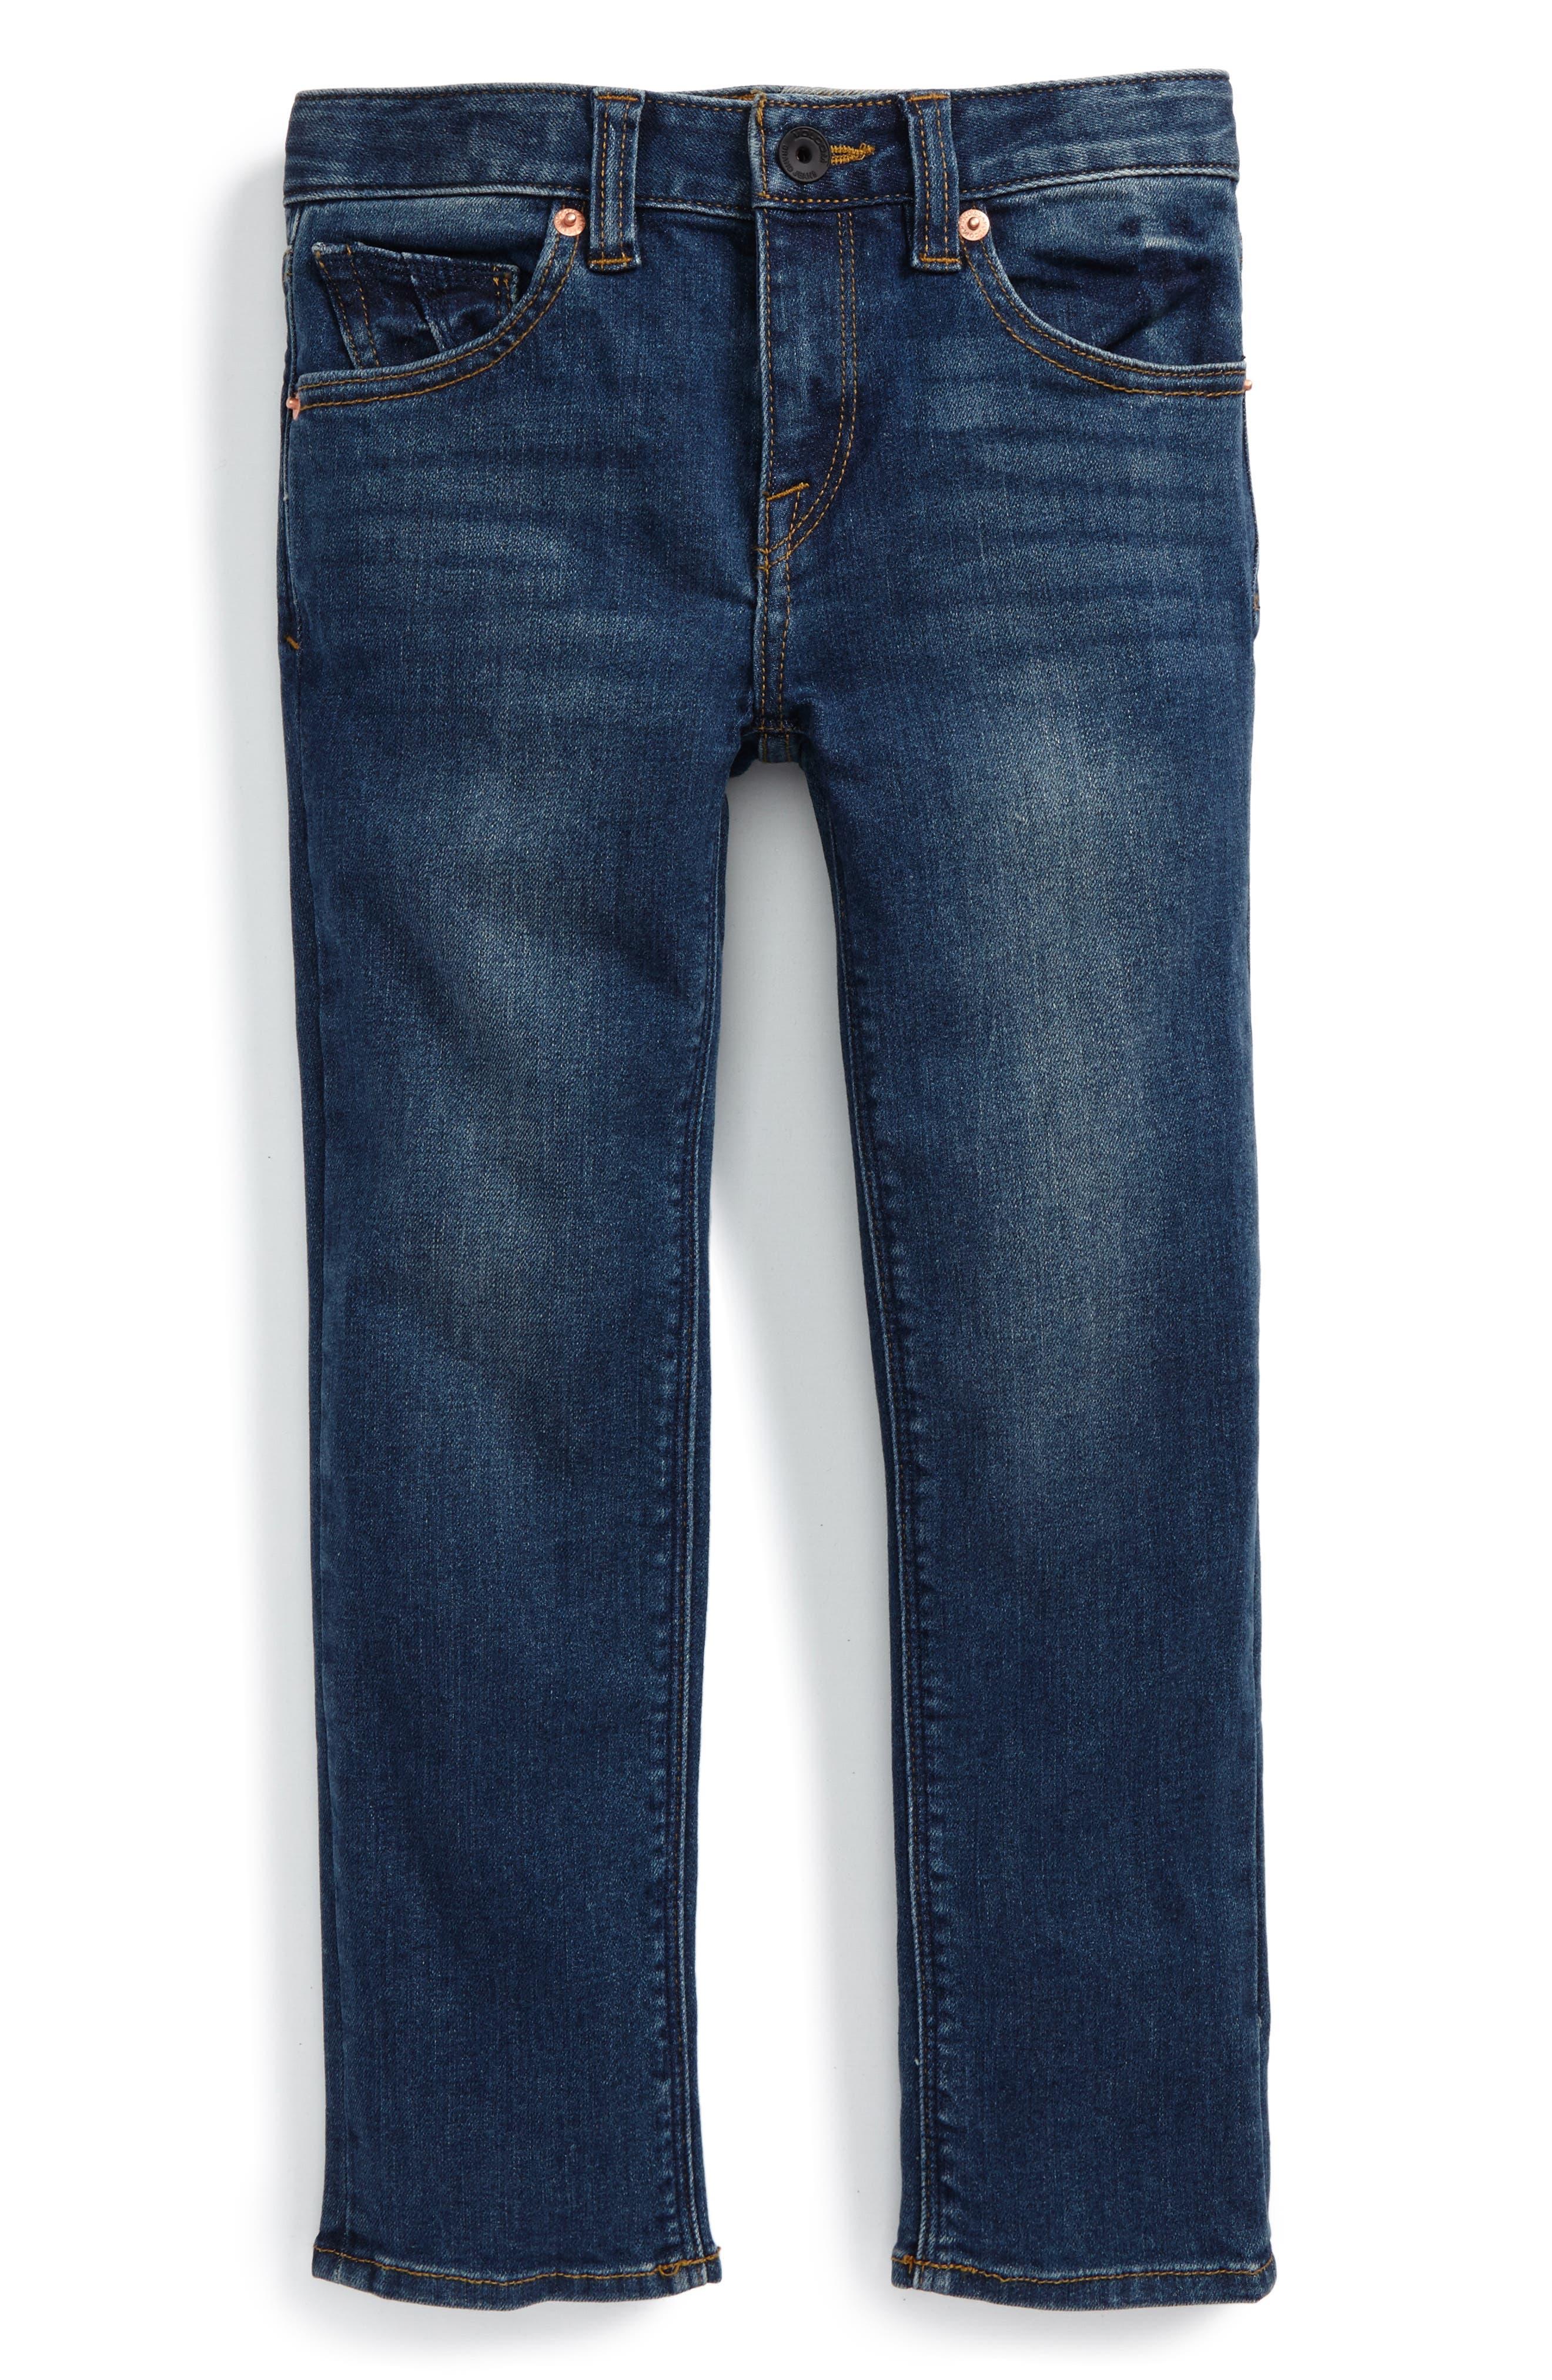 Alternate Image 1 Selected - Volcom 'Vorta' Slim Fit Jeans (Toddler Boys & Little Boys)